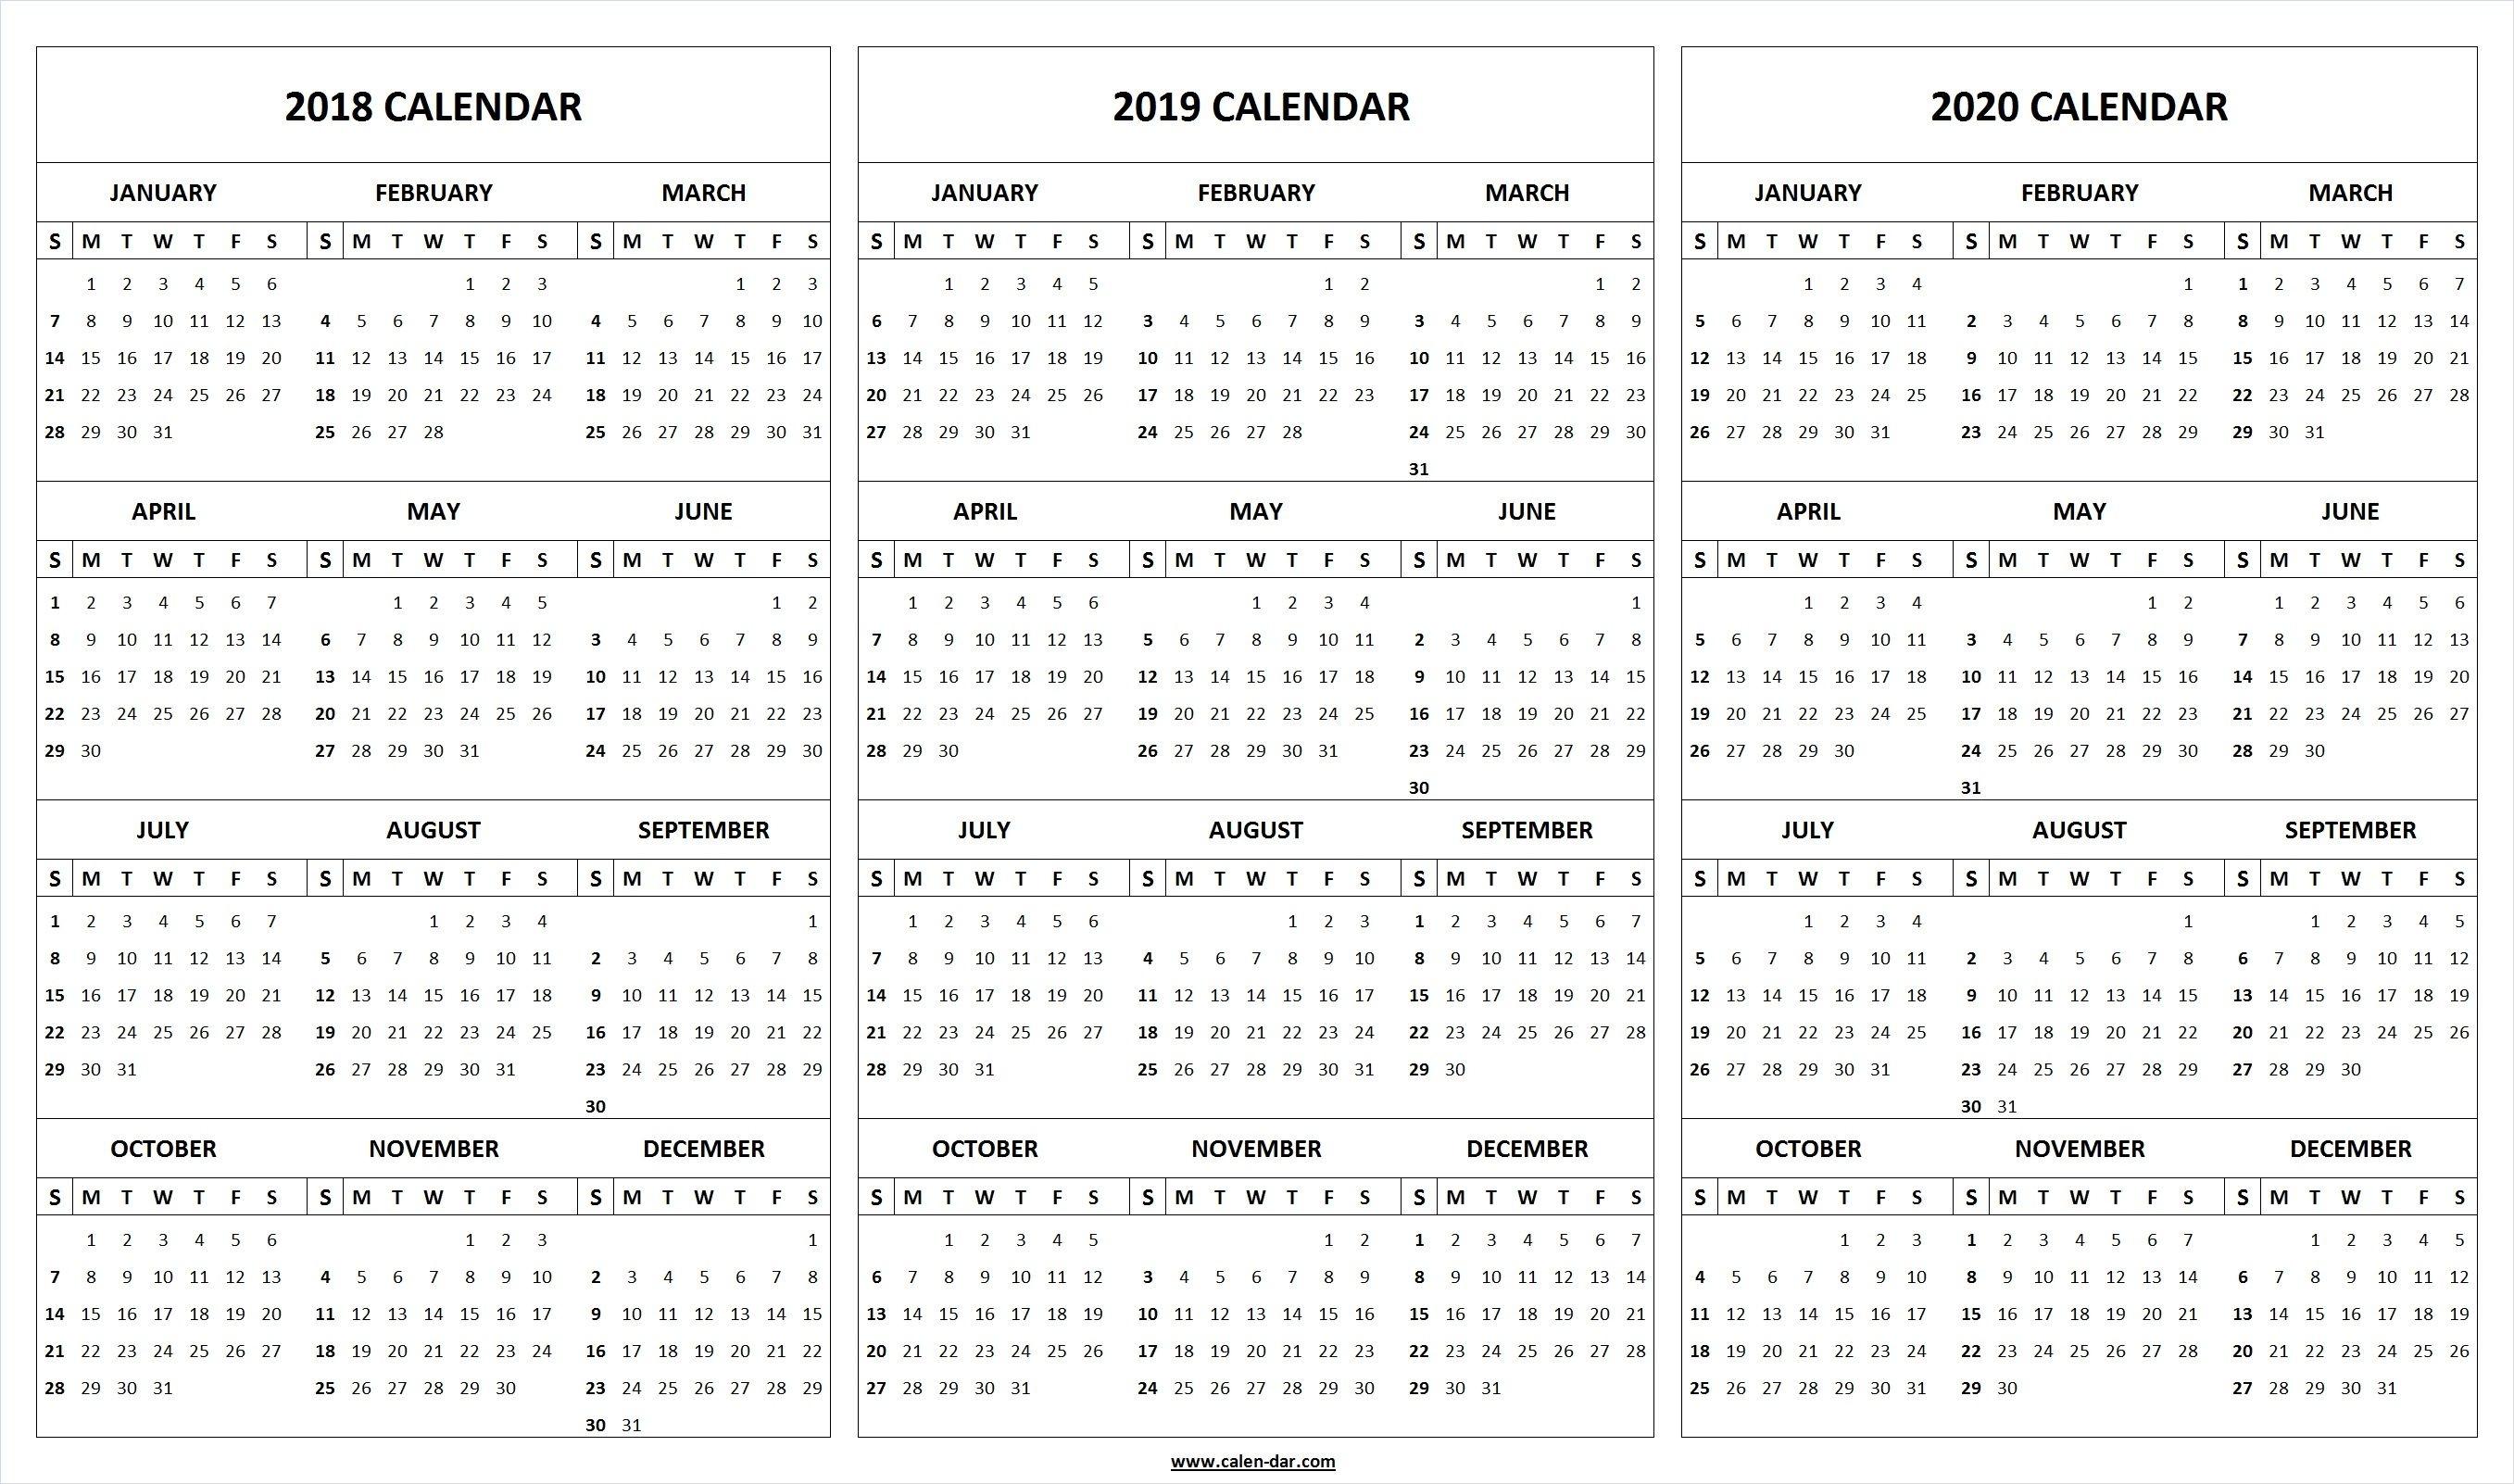 Print Blank 2018 2019 2020 Calendar Template | Organize! | Printable inside Uc Berkeley Calendar 2019 2020